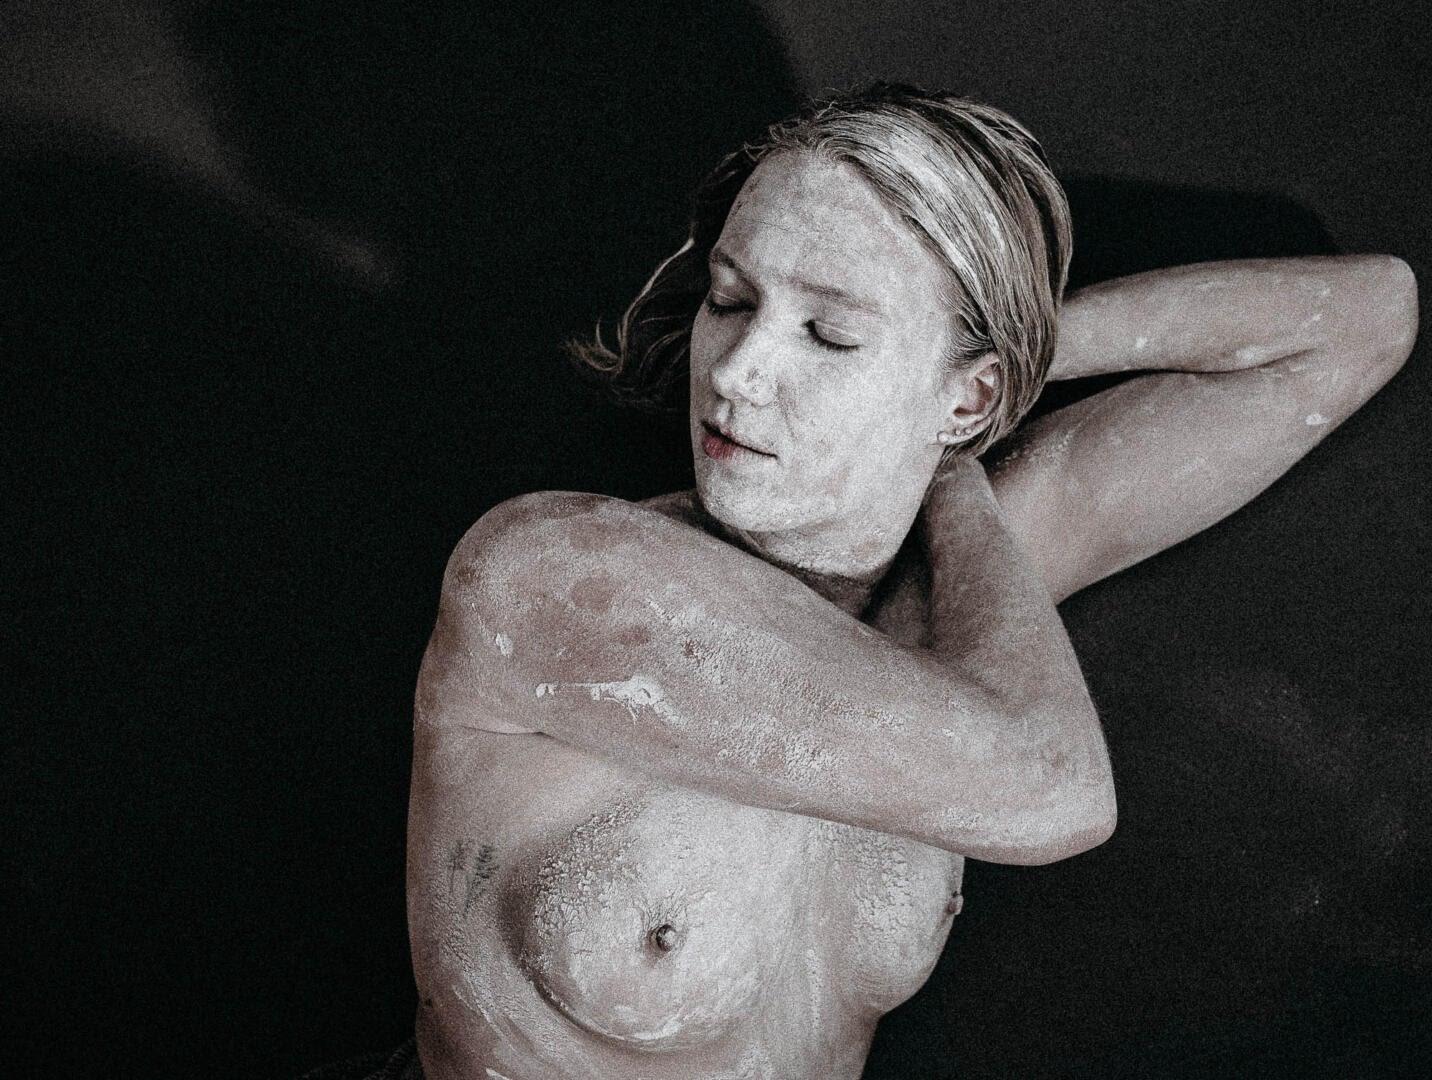 Aktfotografie, Fine-Art Nude Series: feel - Einsamkeit 3